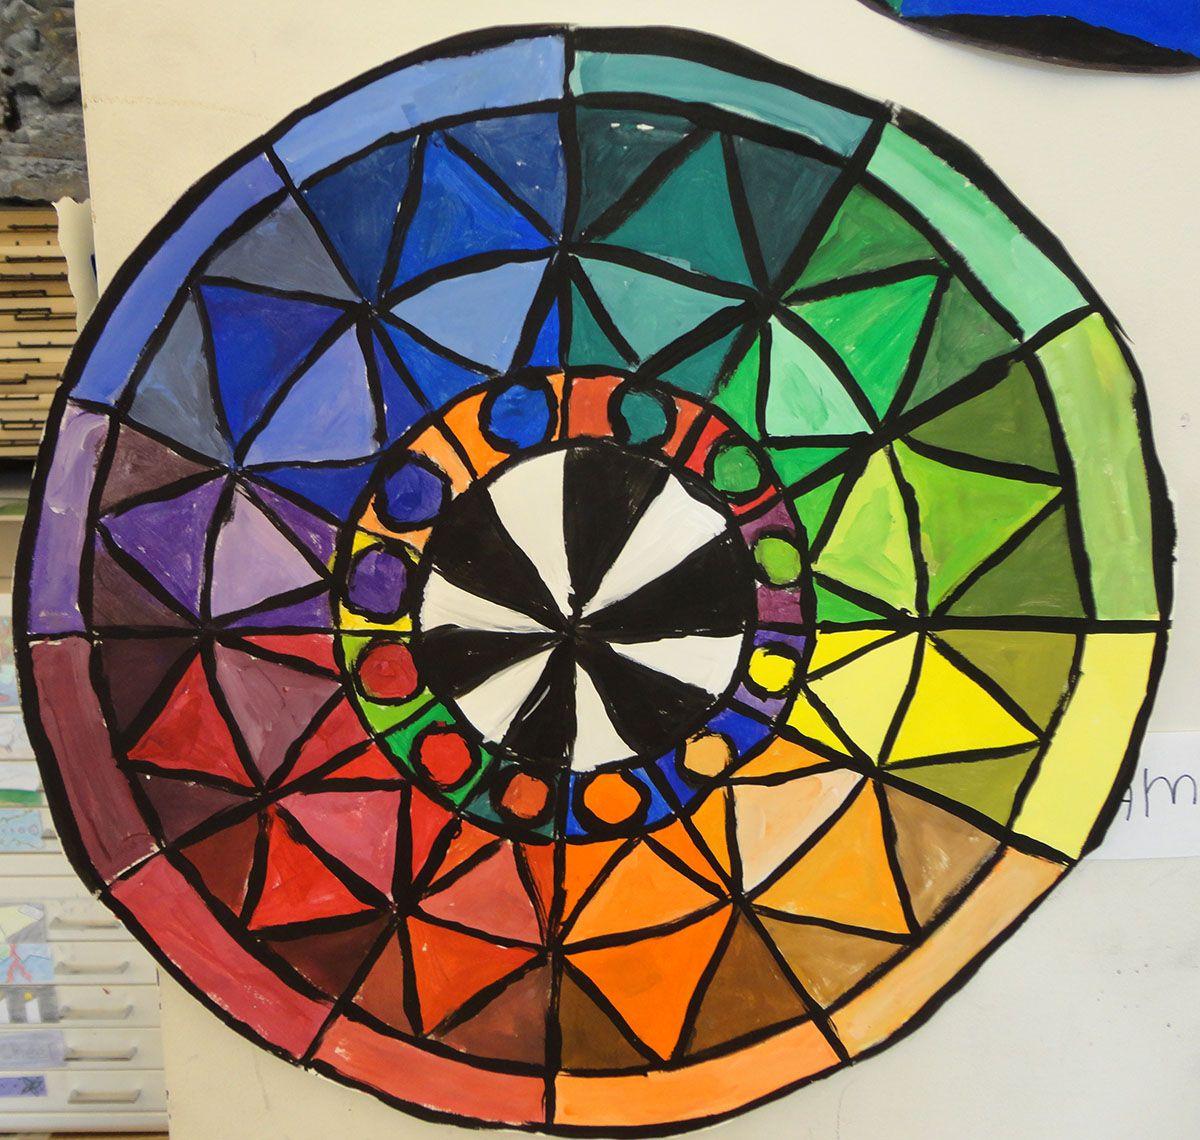 Color wheel art lesson for second grade - Color Wheel Mandalas Art 1